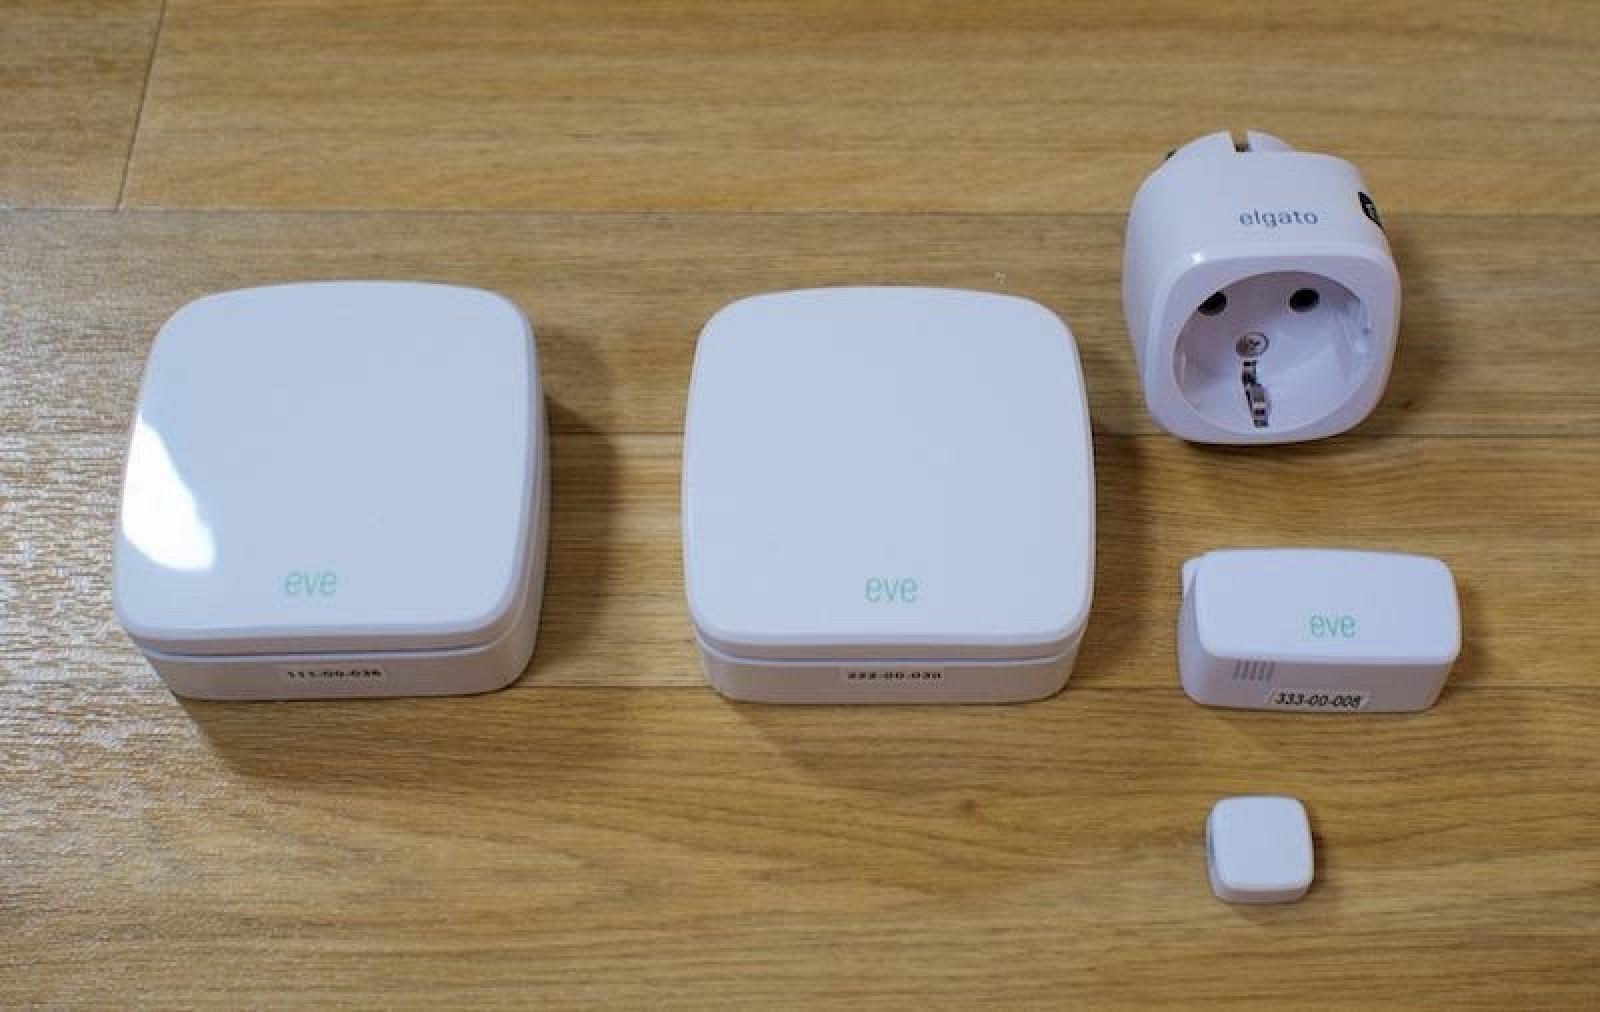 elgato 39 s 39 eve 39 smart home accessories are useful but hampered by buggy homekit platform mac. Black Bedroom Furniture Sets. Home Design Ideas